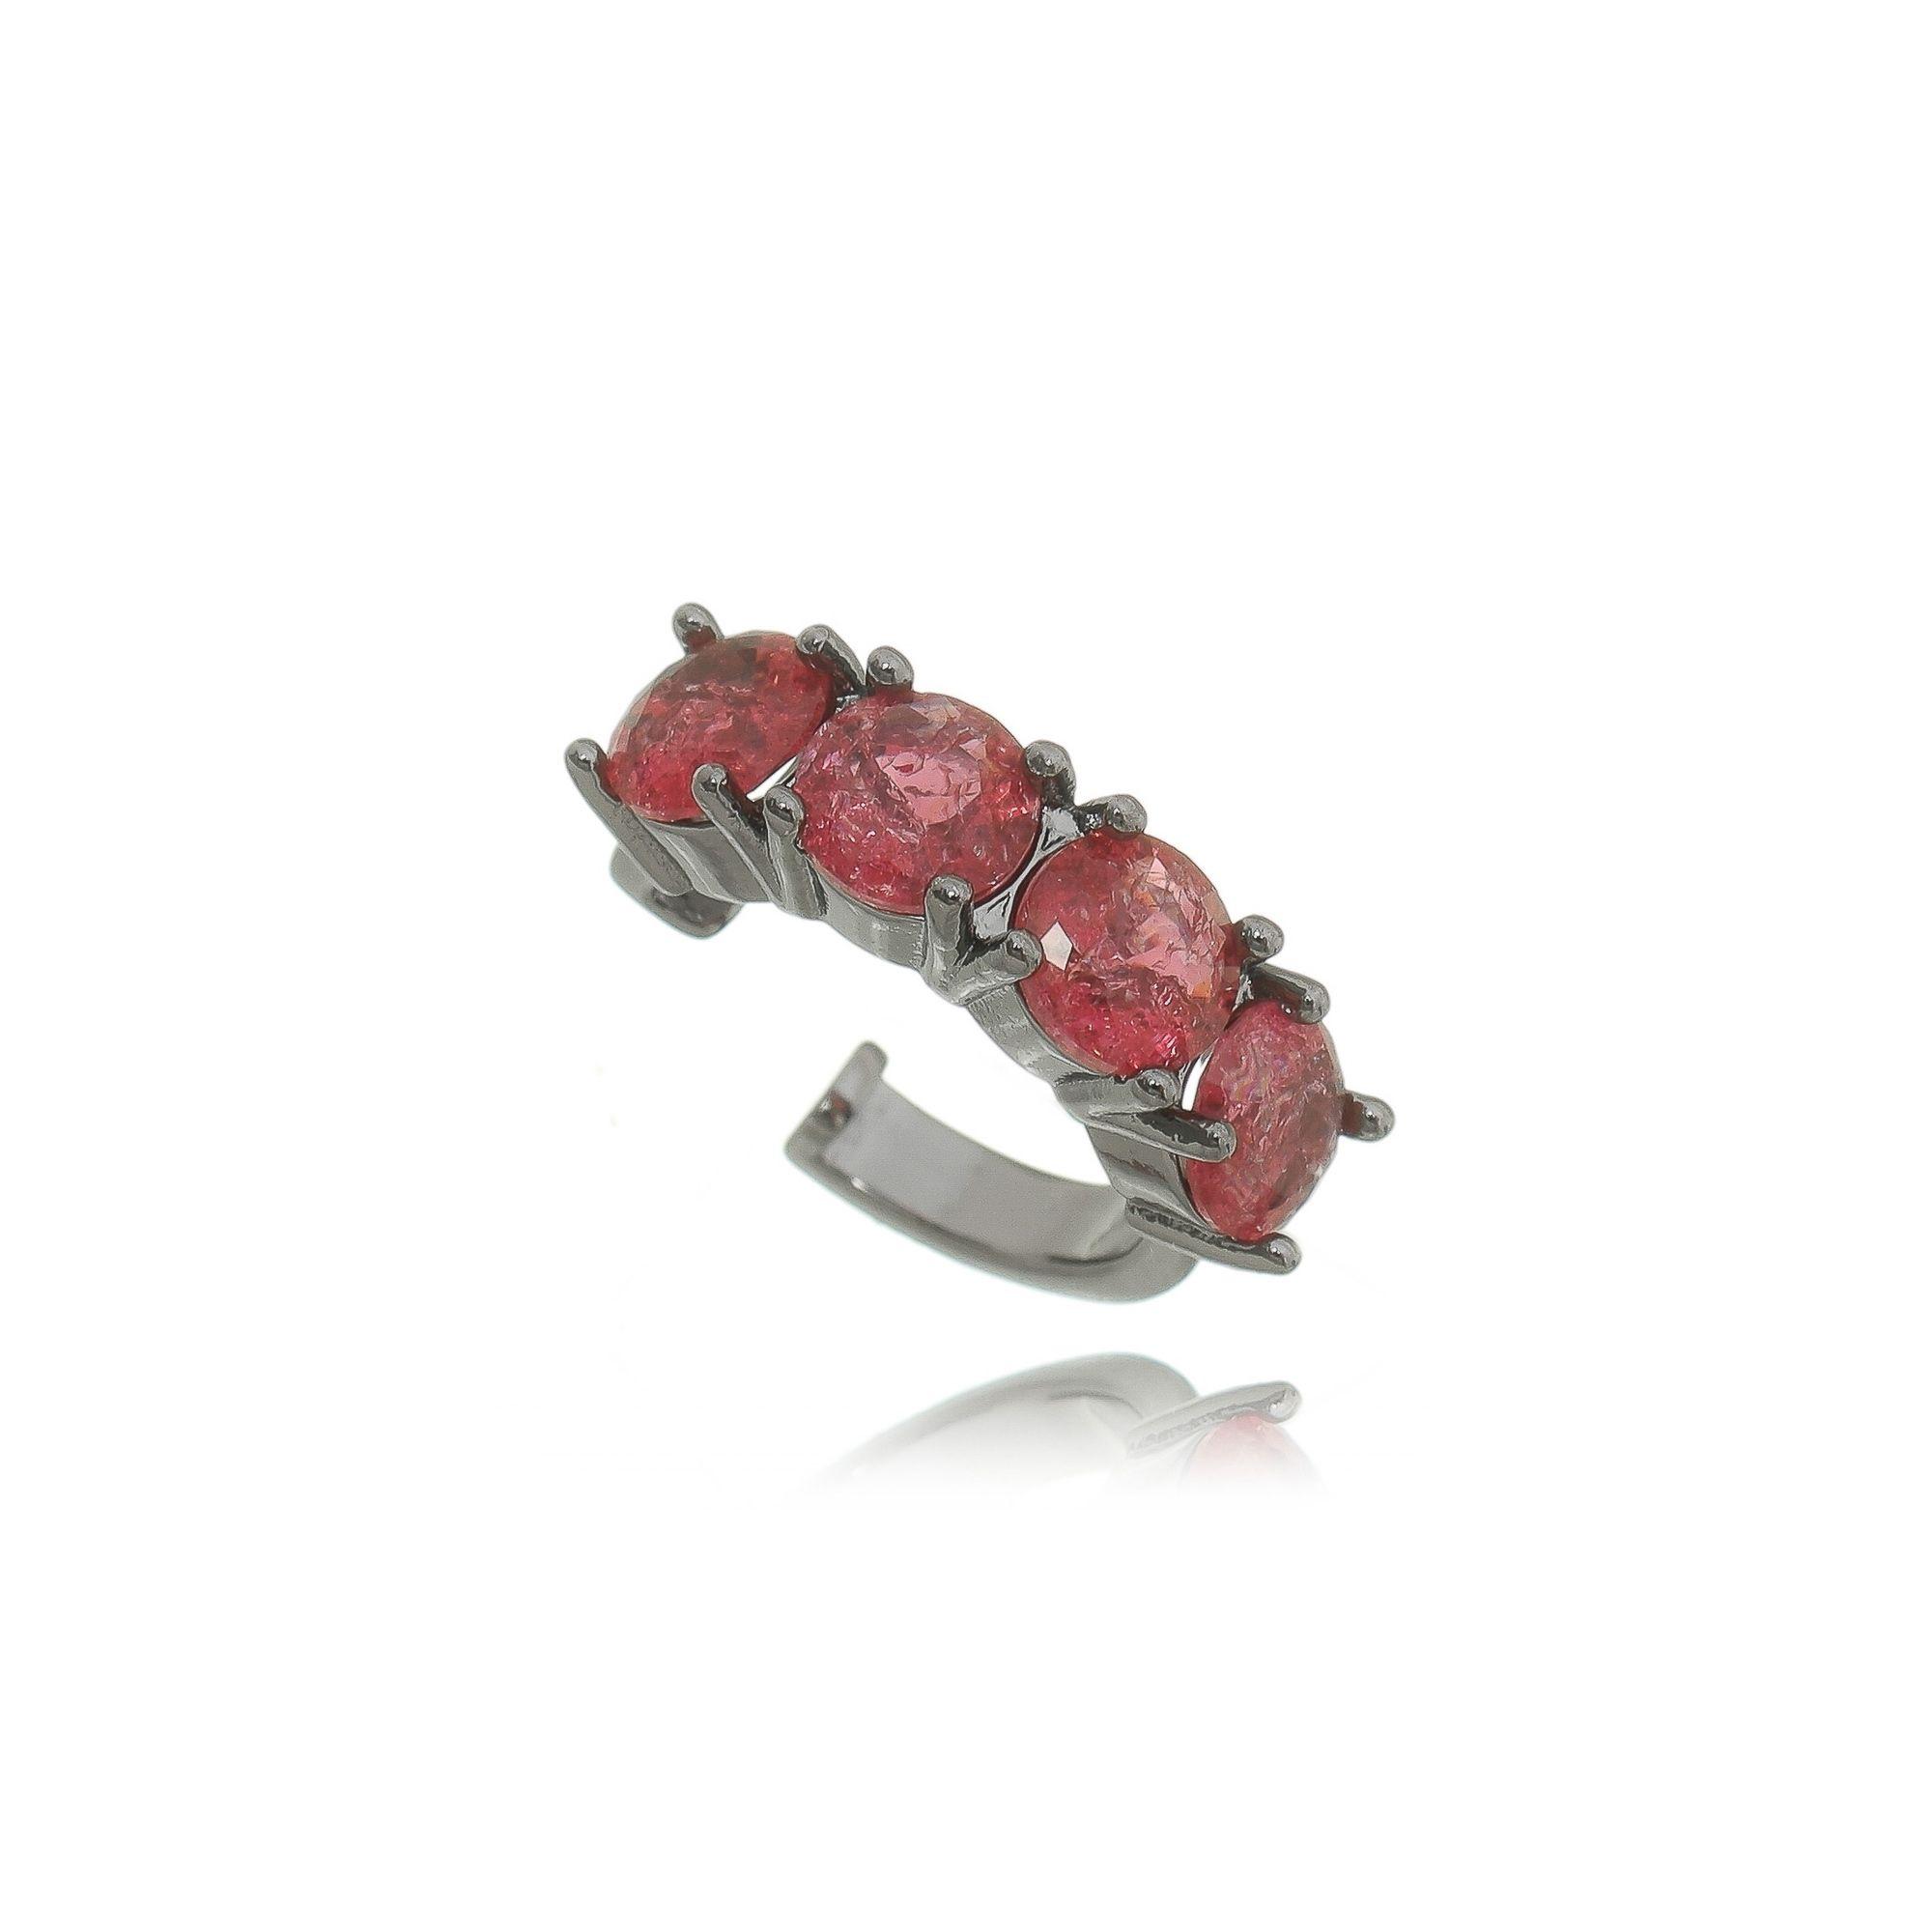 Piercing Falso Pedra Fusion Rubi Rosa Semijoia em Ródio Negro  - Soloyou